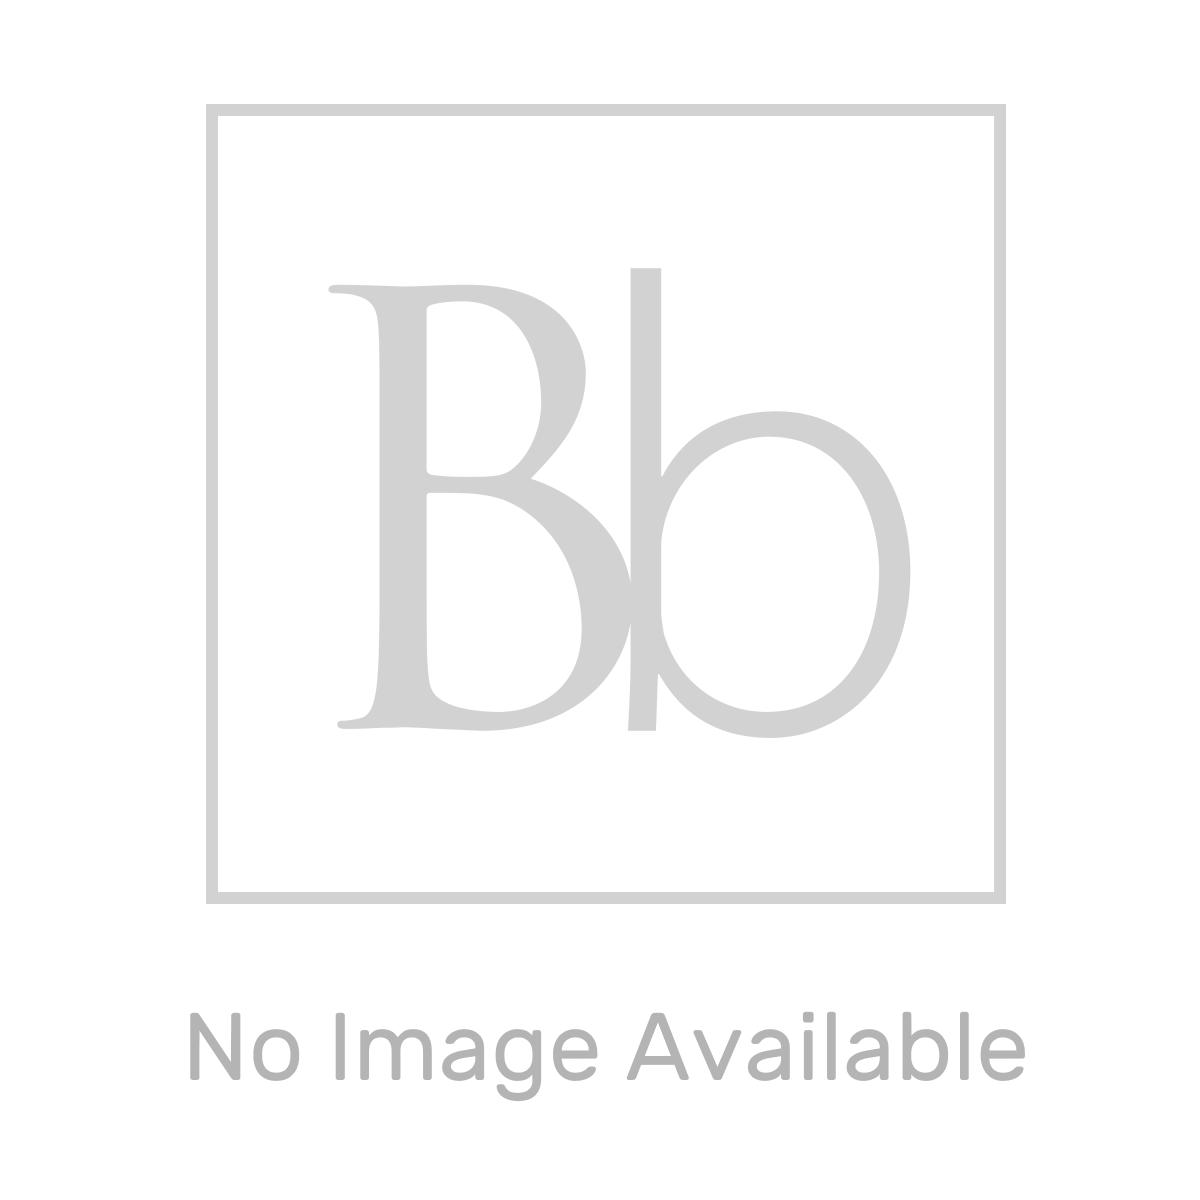 Sensio Avalon Bluetooth Backlit LED mirror 4